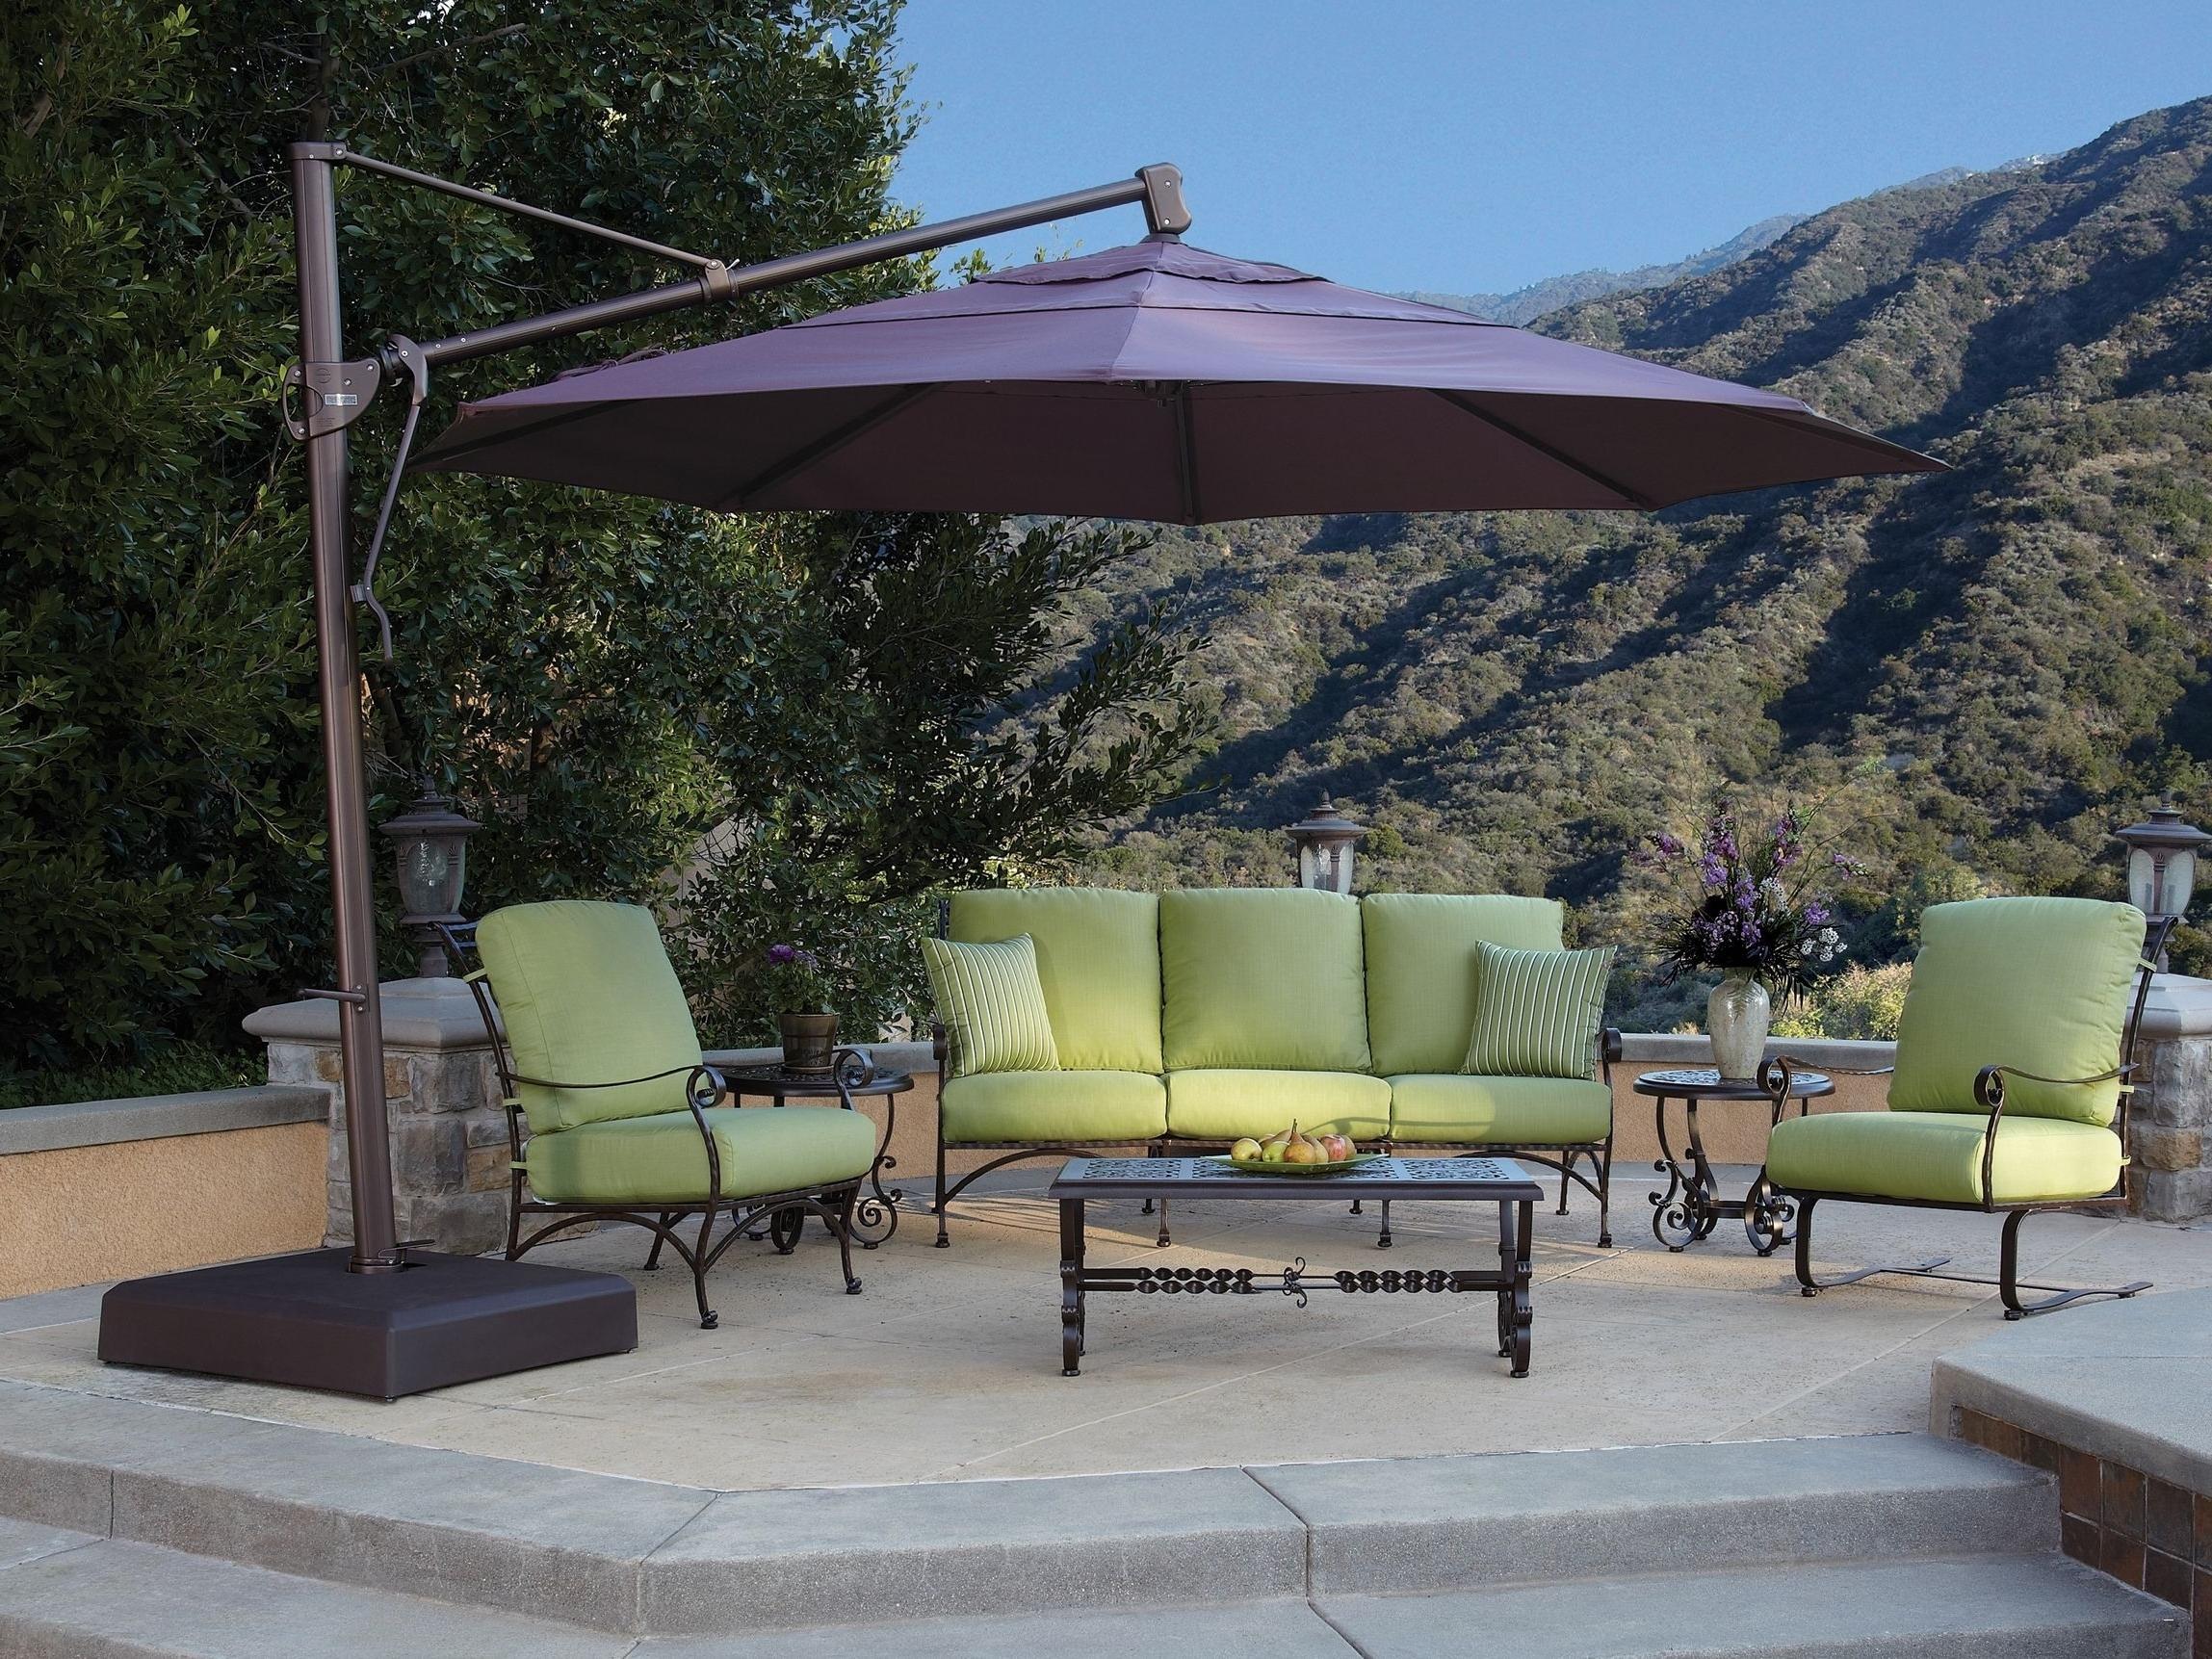 Most Recently Released Garden Treasures Patio Umbrella – Amazing Cool Elegant Patio Within Patio Umbrellas At Lowes (View 8 of 20)